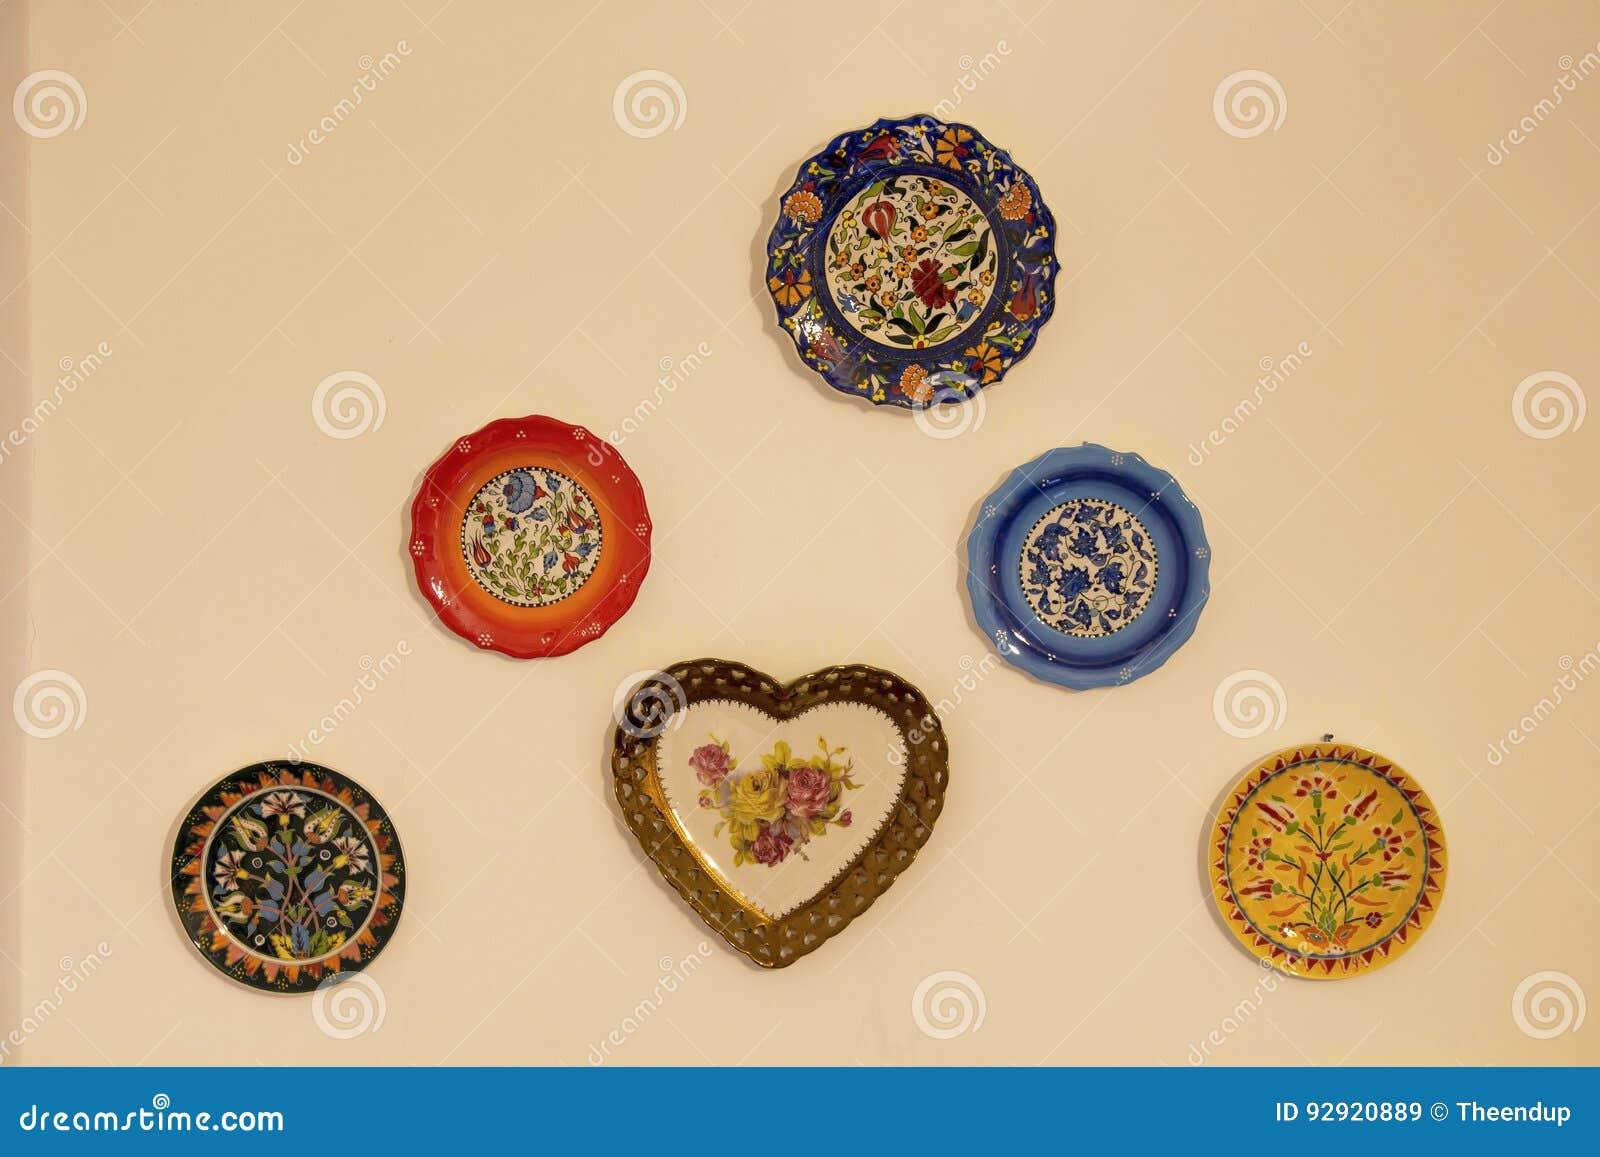 Decorative Ceramic Plates On Beige Wall Stock Image Image Of Handicraft Decor 92920889